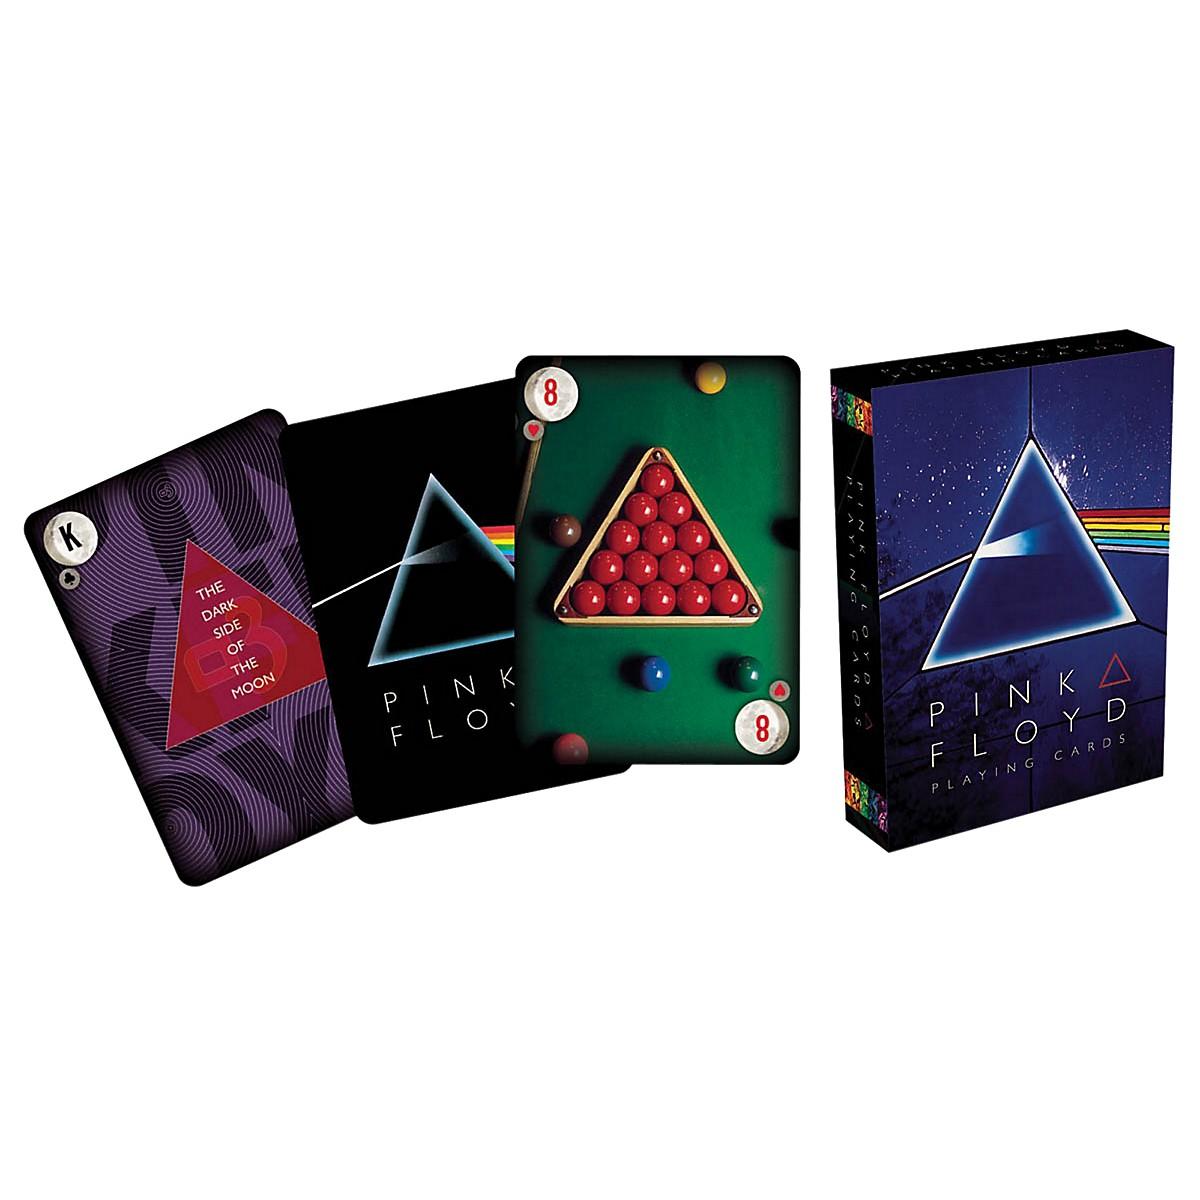 Hal Leonard Pink Floyd - Dark Side of the Moon Playing Cards